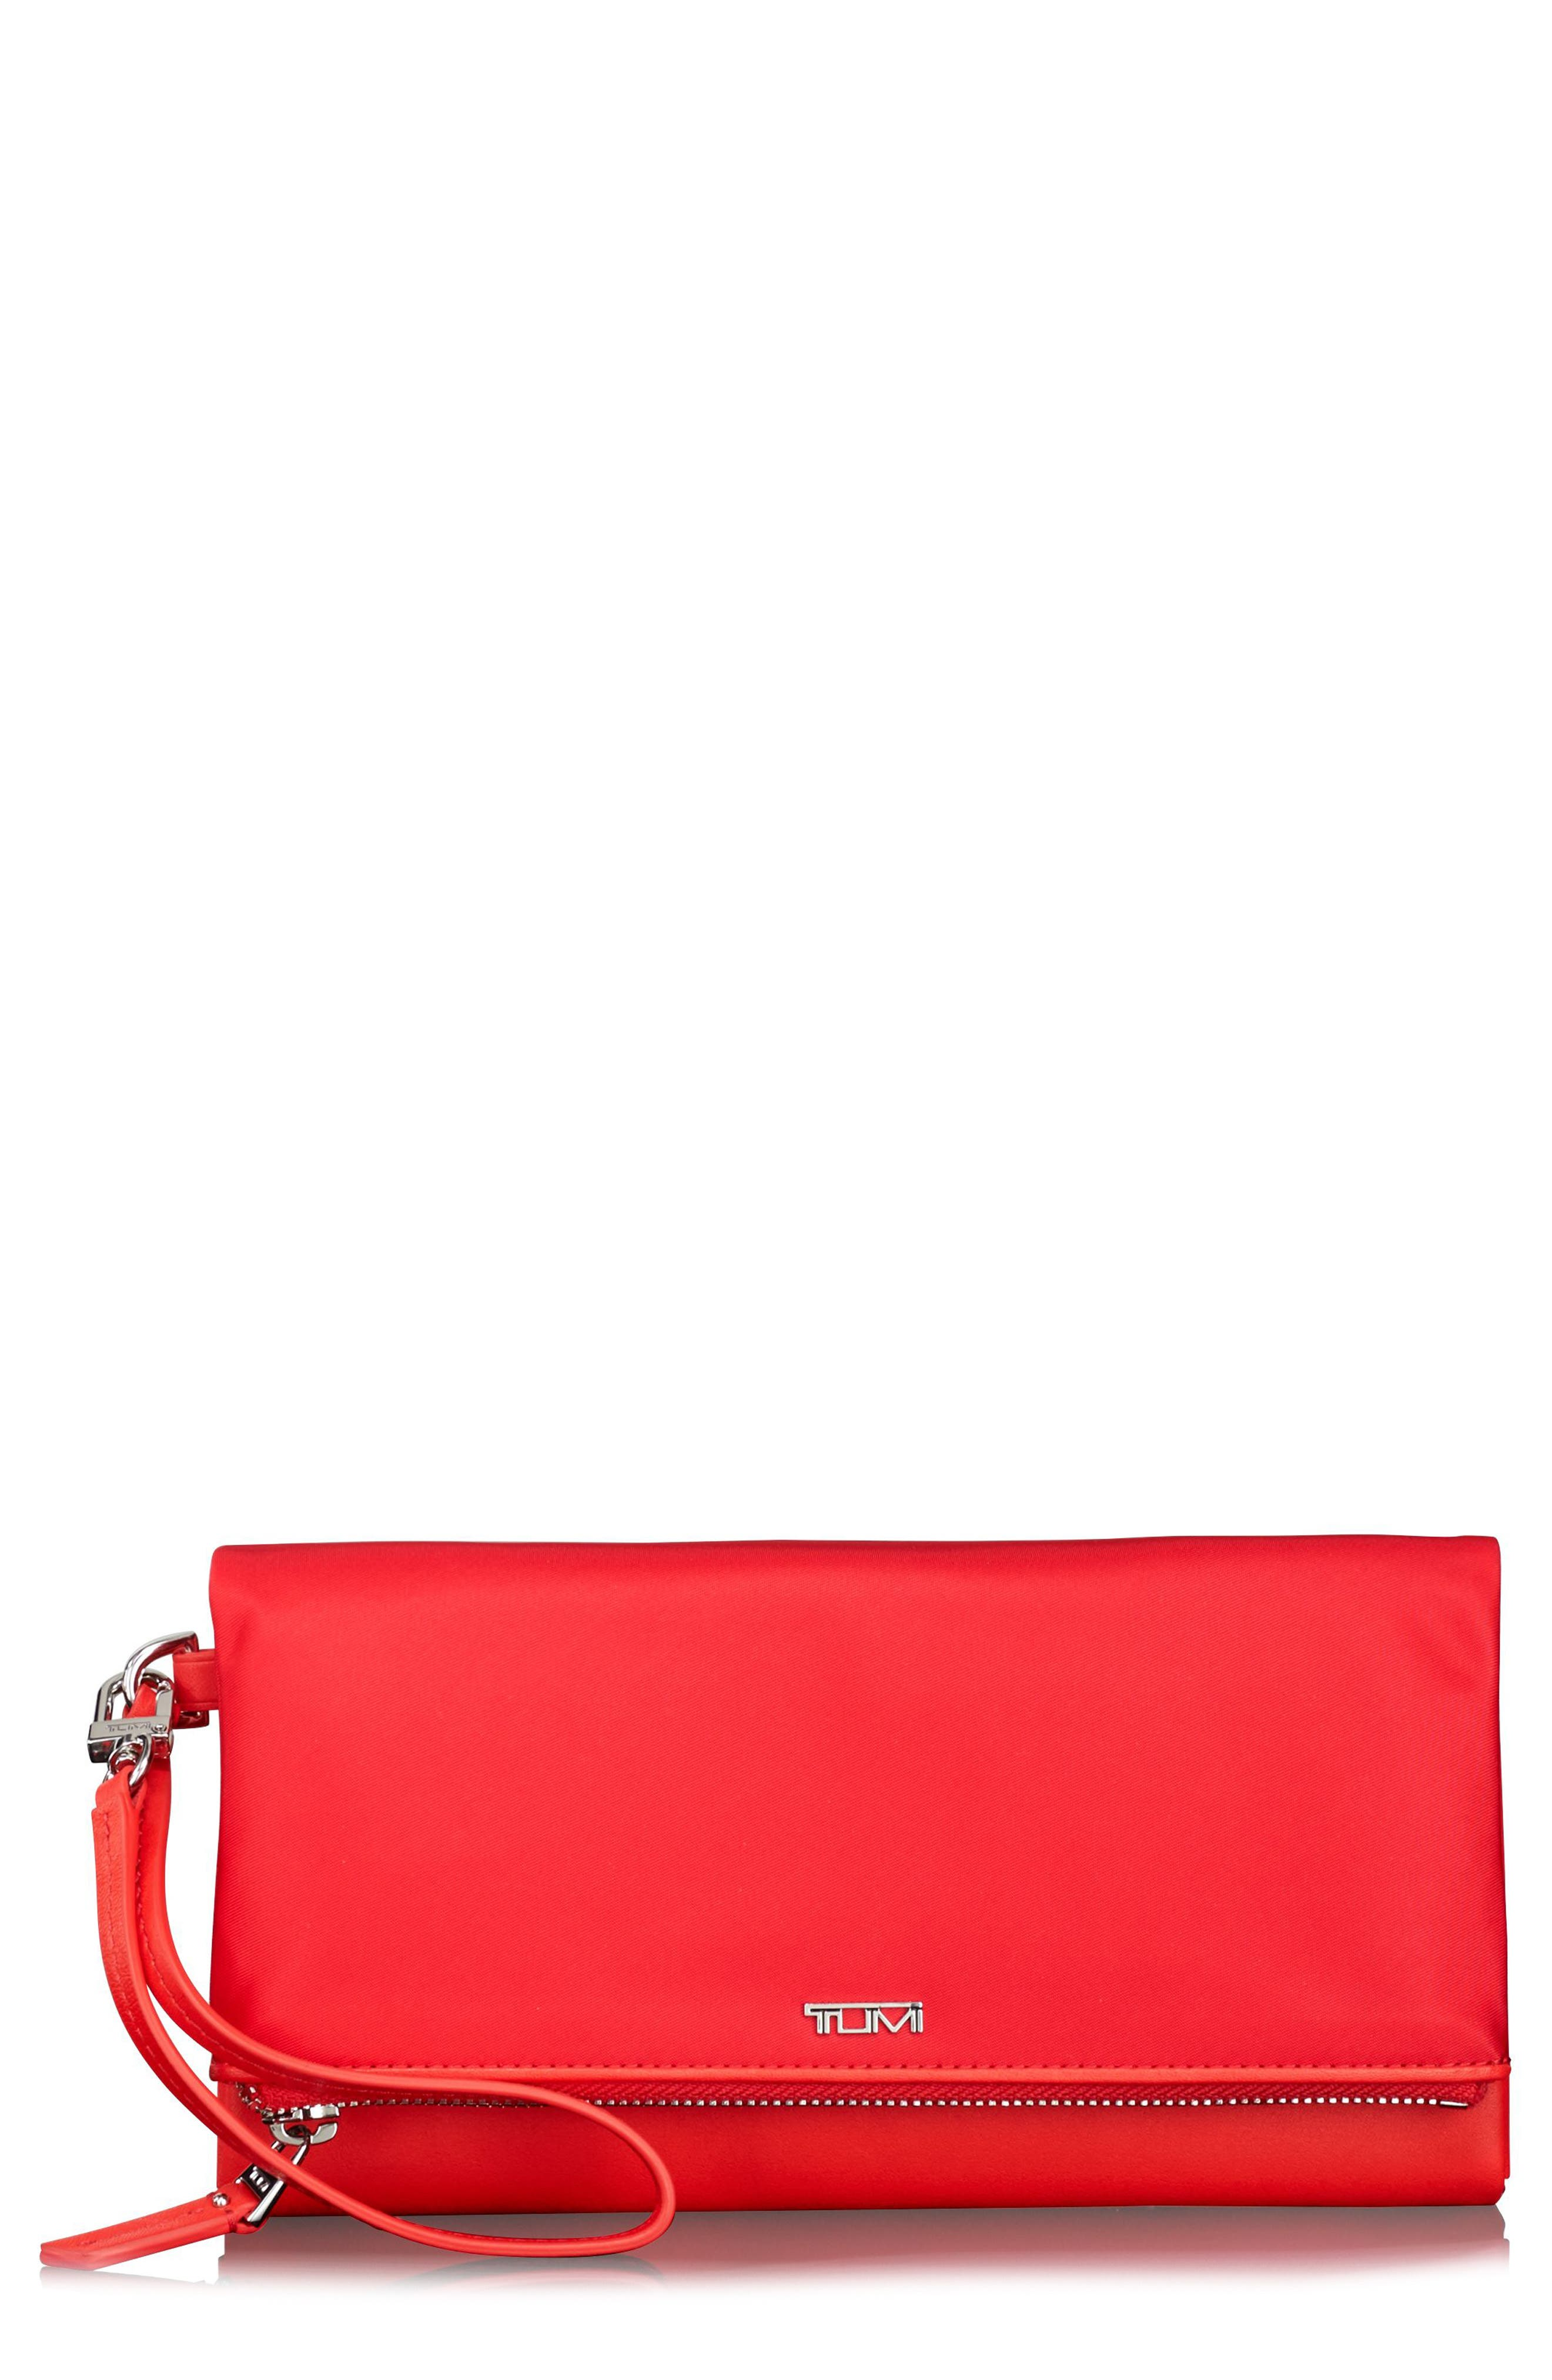 Alternate Image 1 Selected - Tumi Travel Flap Wallet